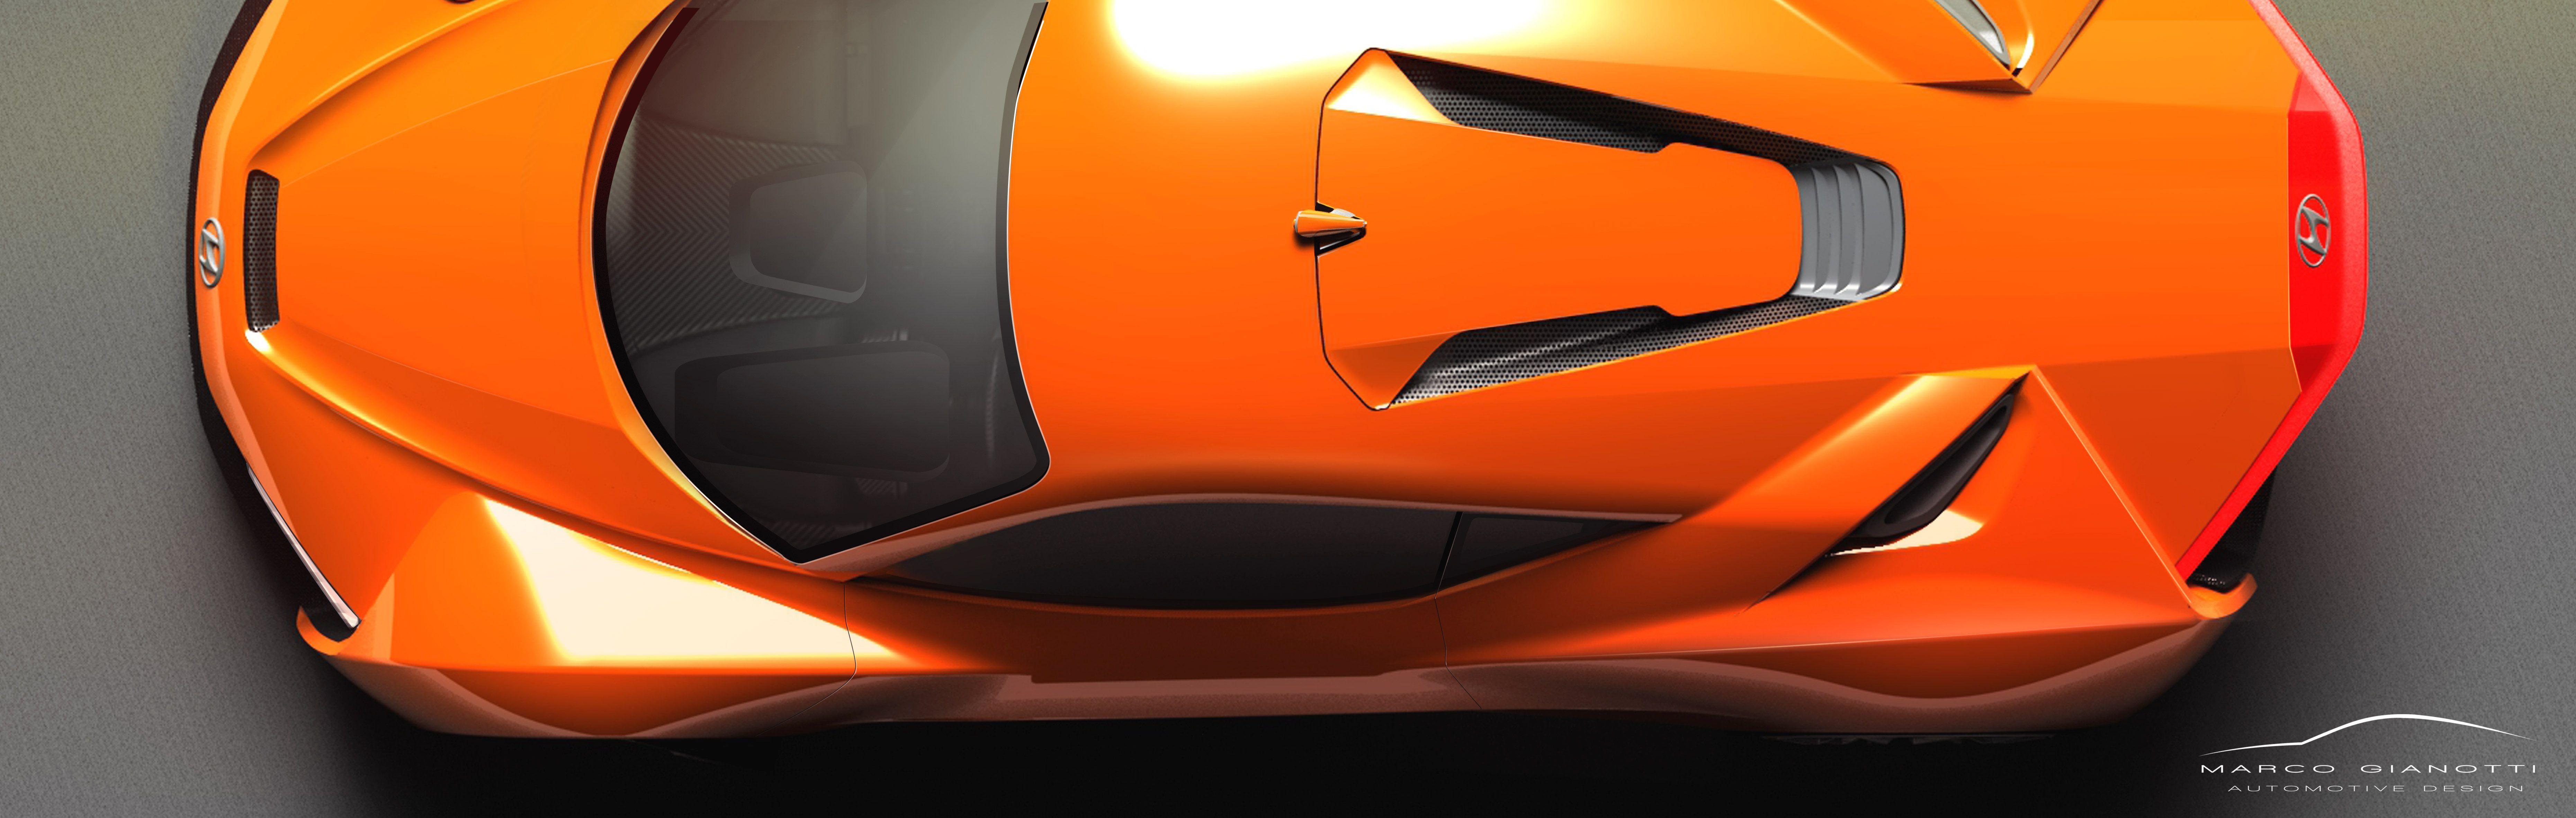 Project Hyundai Passocorto Rendering Top View Marco Gianotti